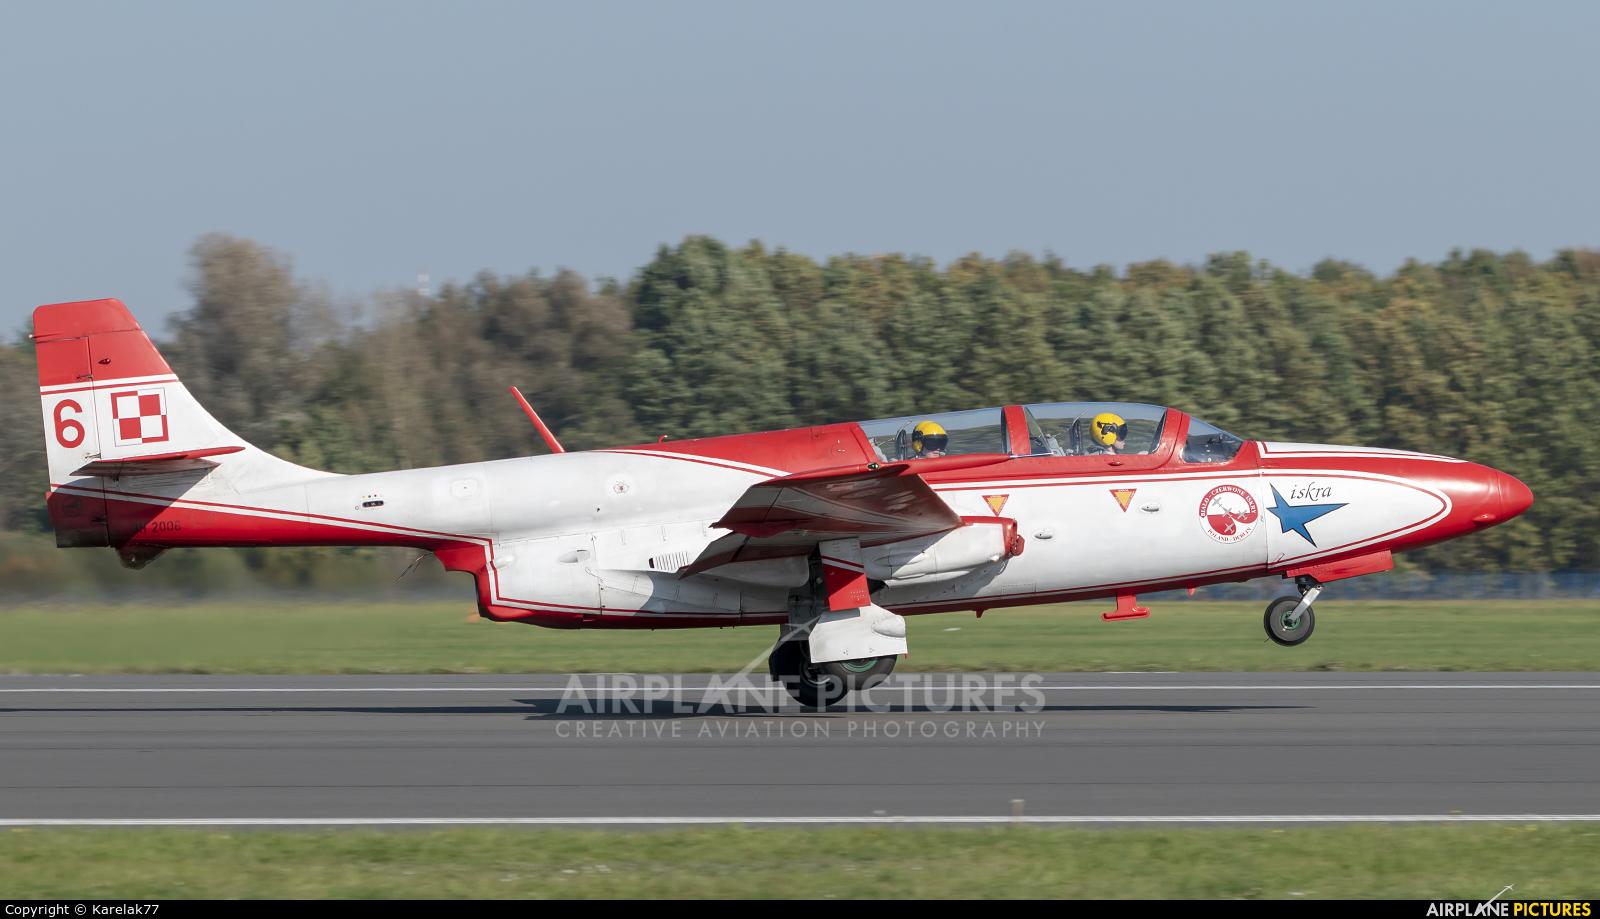 Poland - Air Force: White & Red Iskras 3H 2006 aircraft at Dęblin